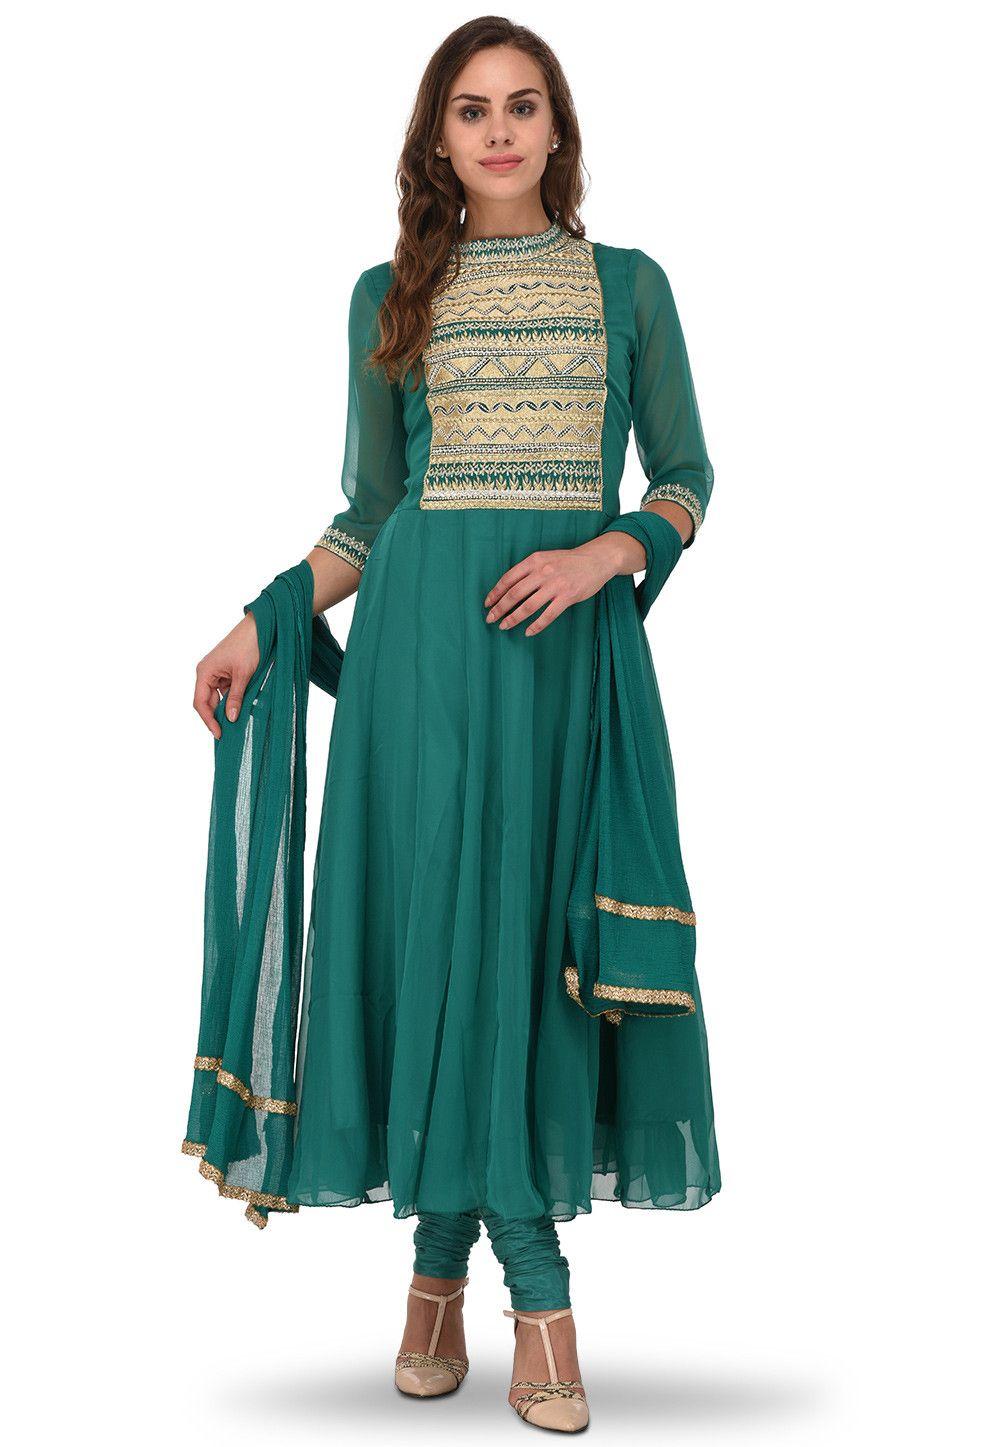 Embroidered Georgette Anarkali Suit in Teal Green : KUZ278 | Wedding ...